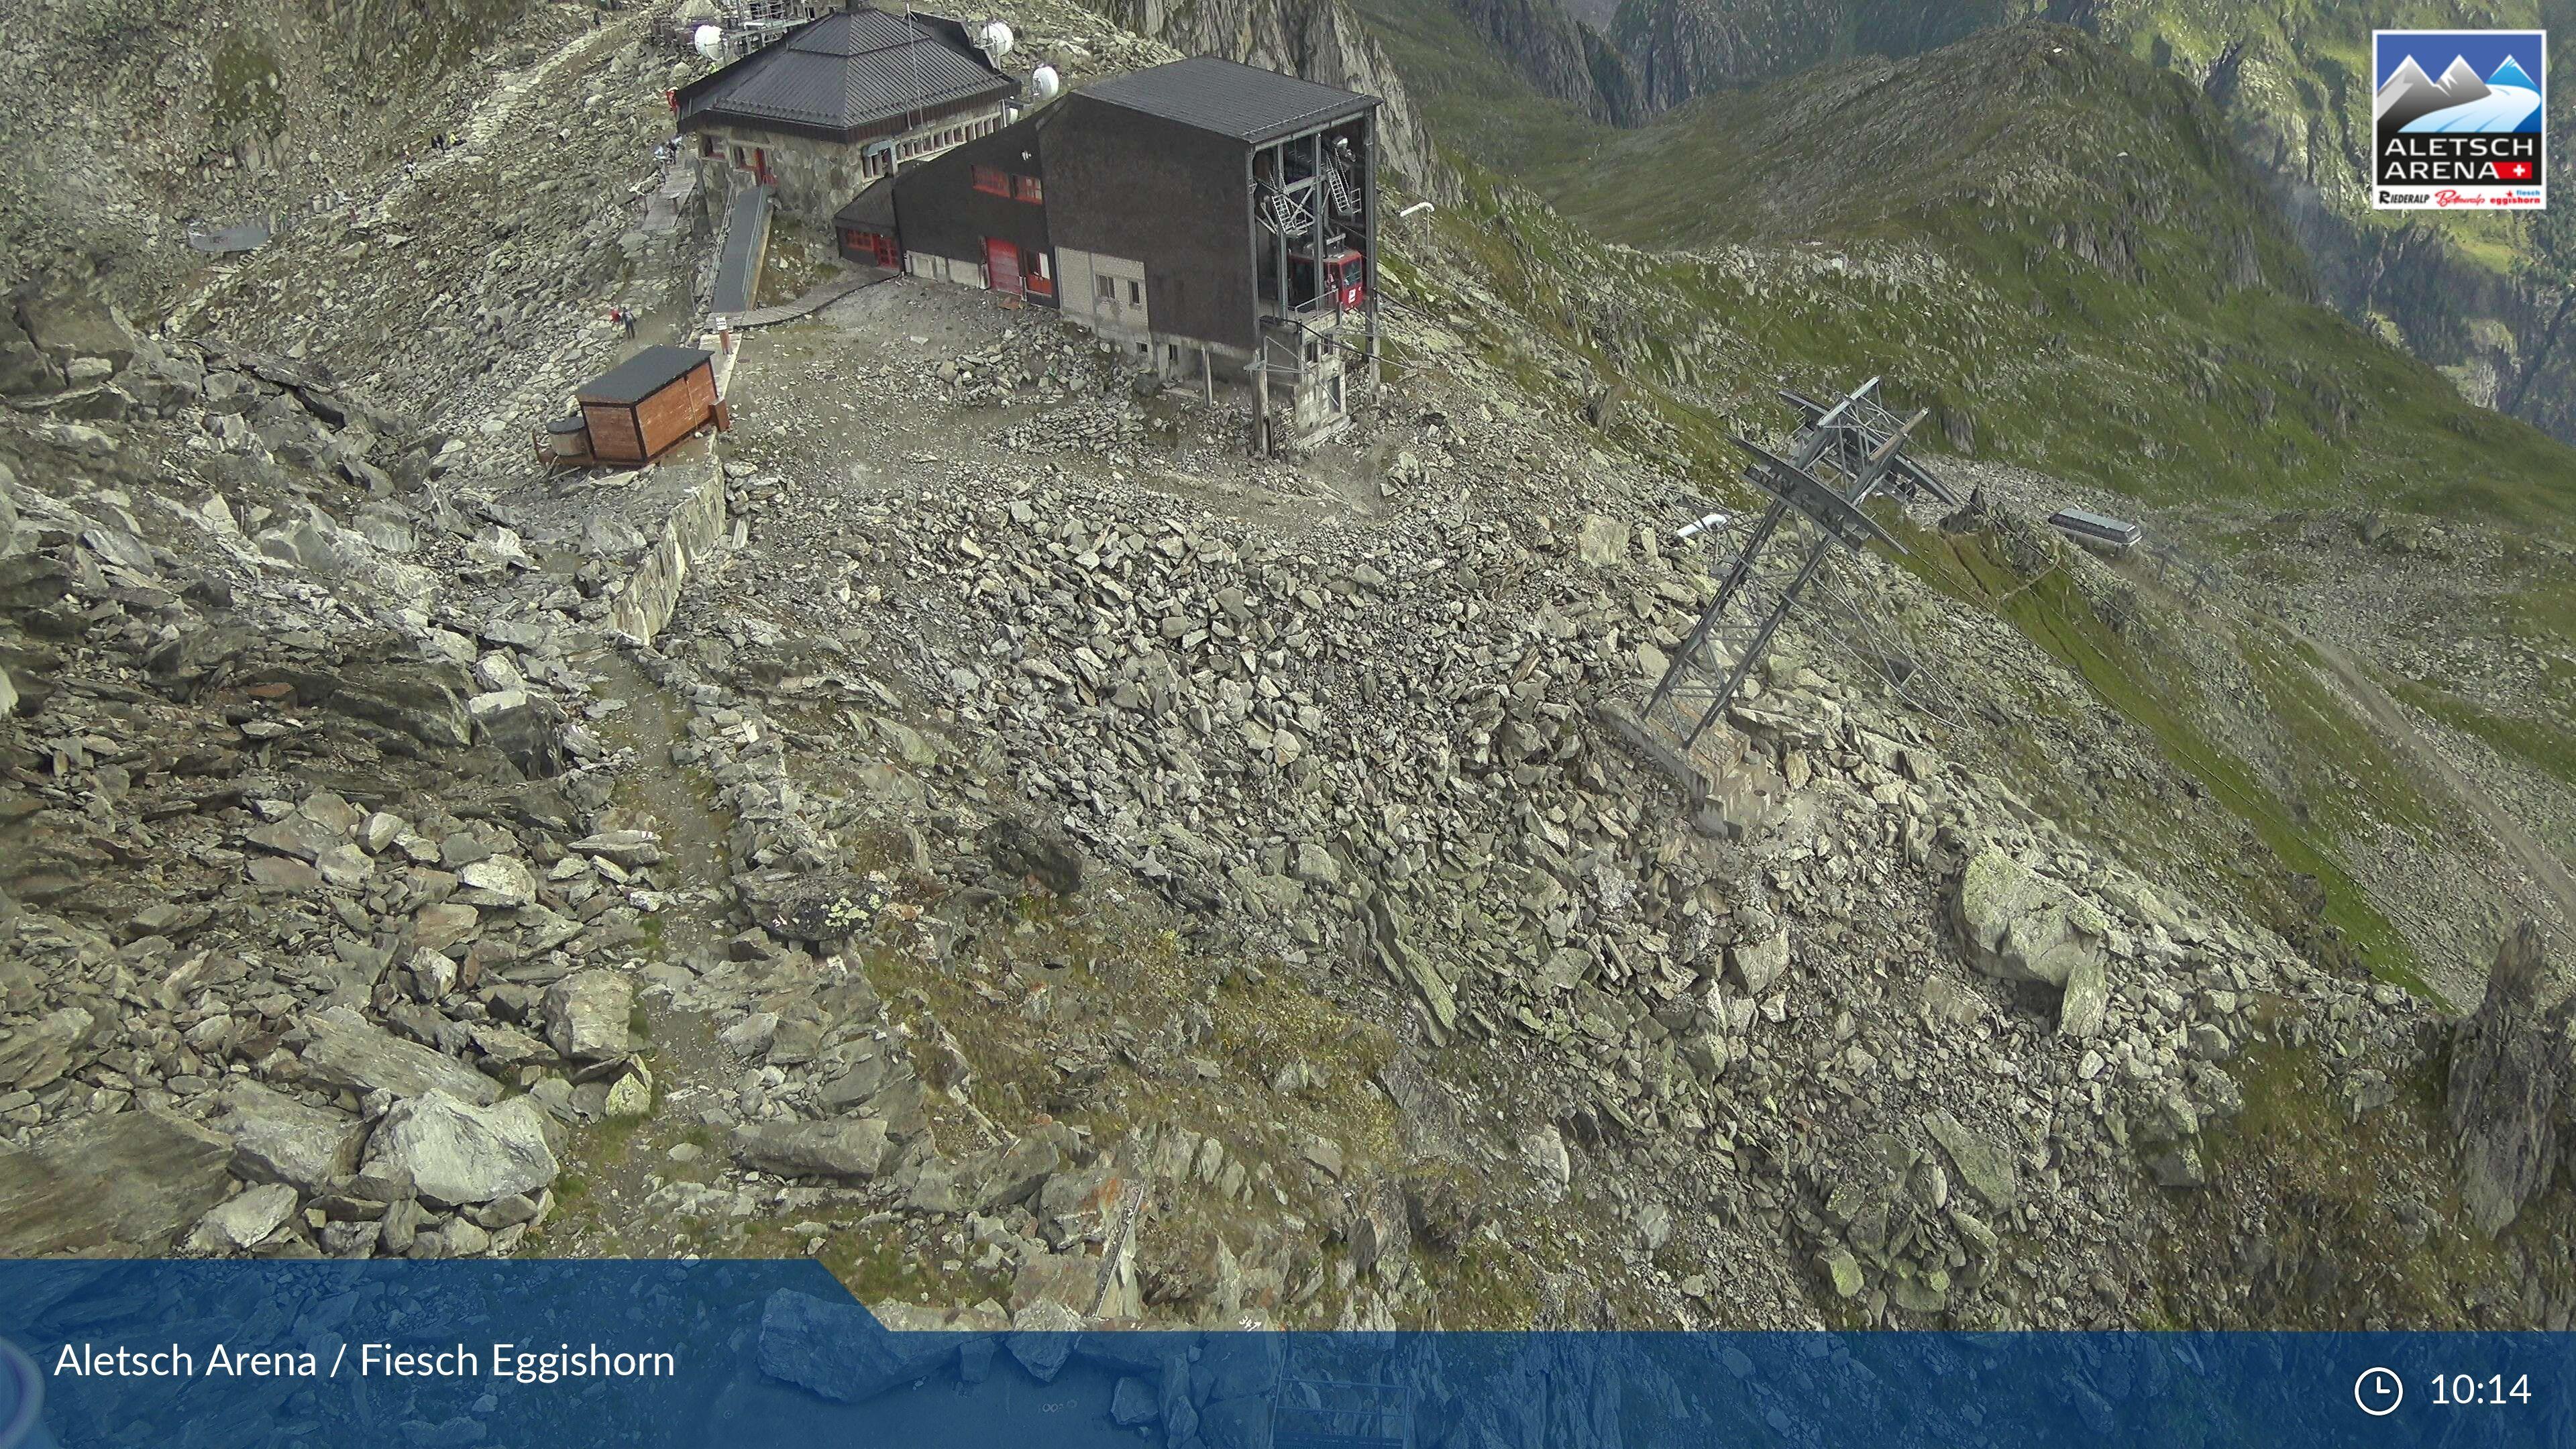 Fiesch: Aletsch Arena - Bergstation Eggishorn, Bergstation